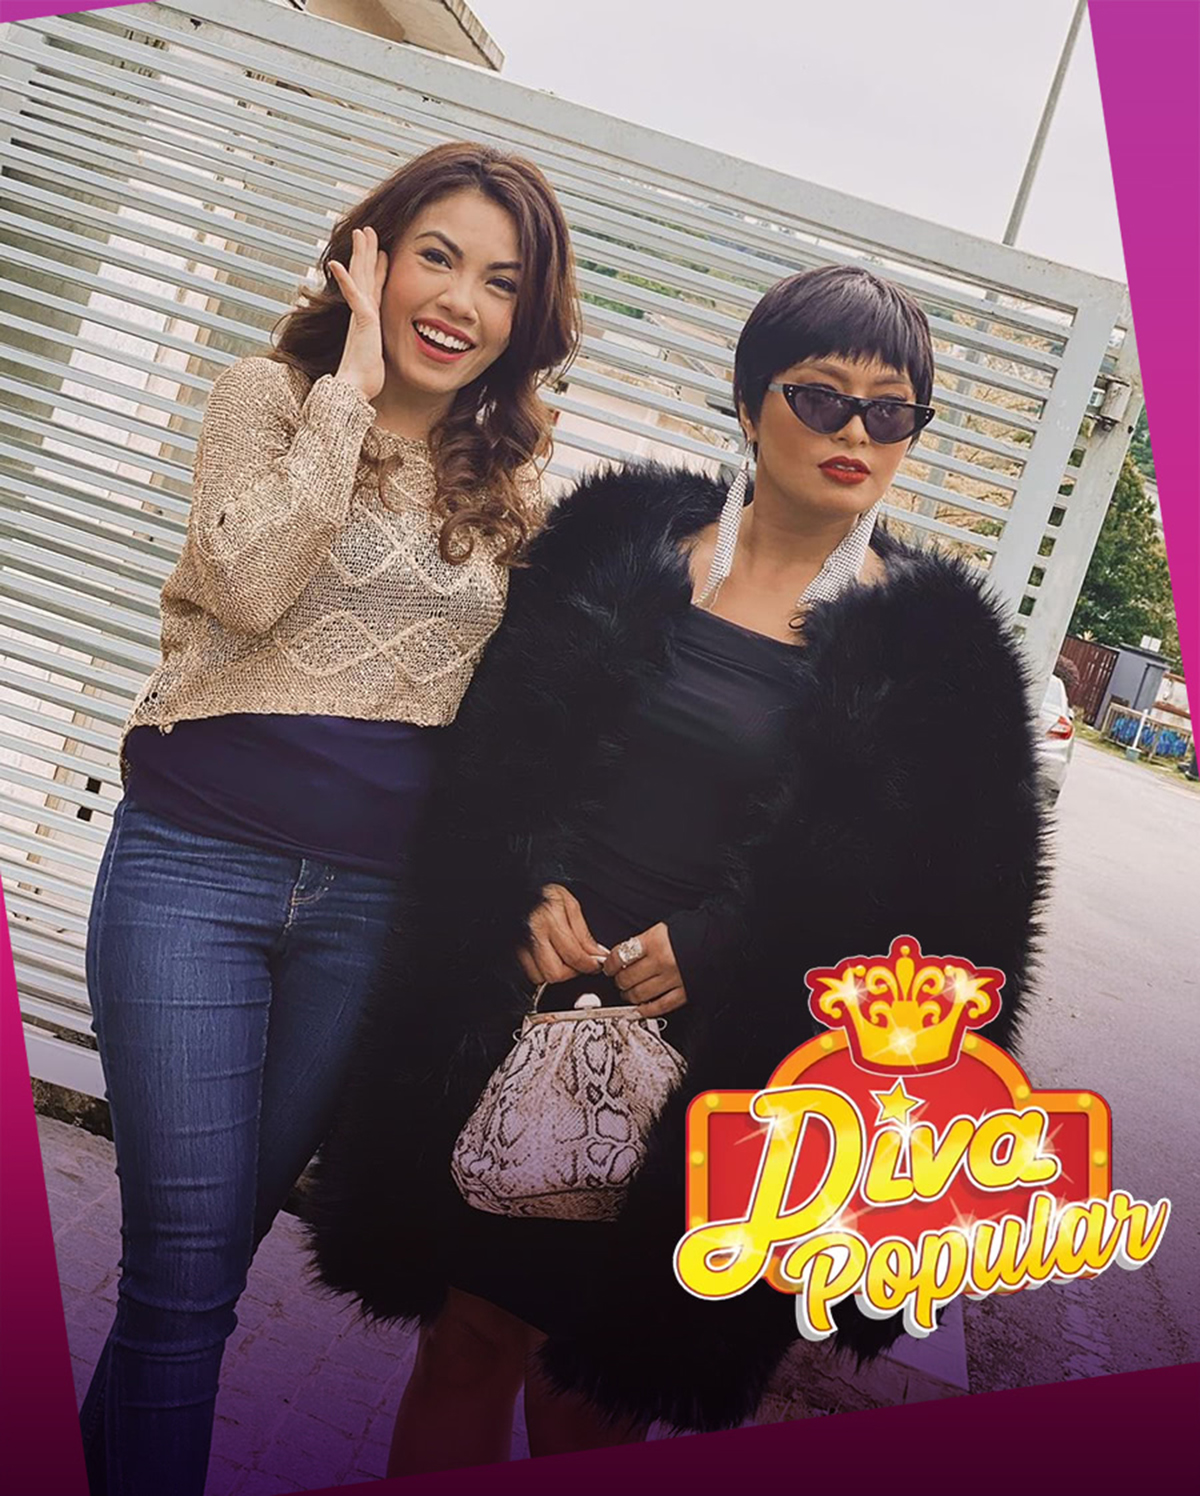 Drama Diva Popular (Awesome TV)